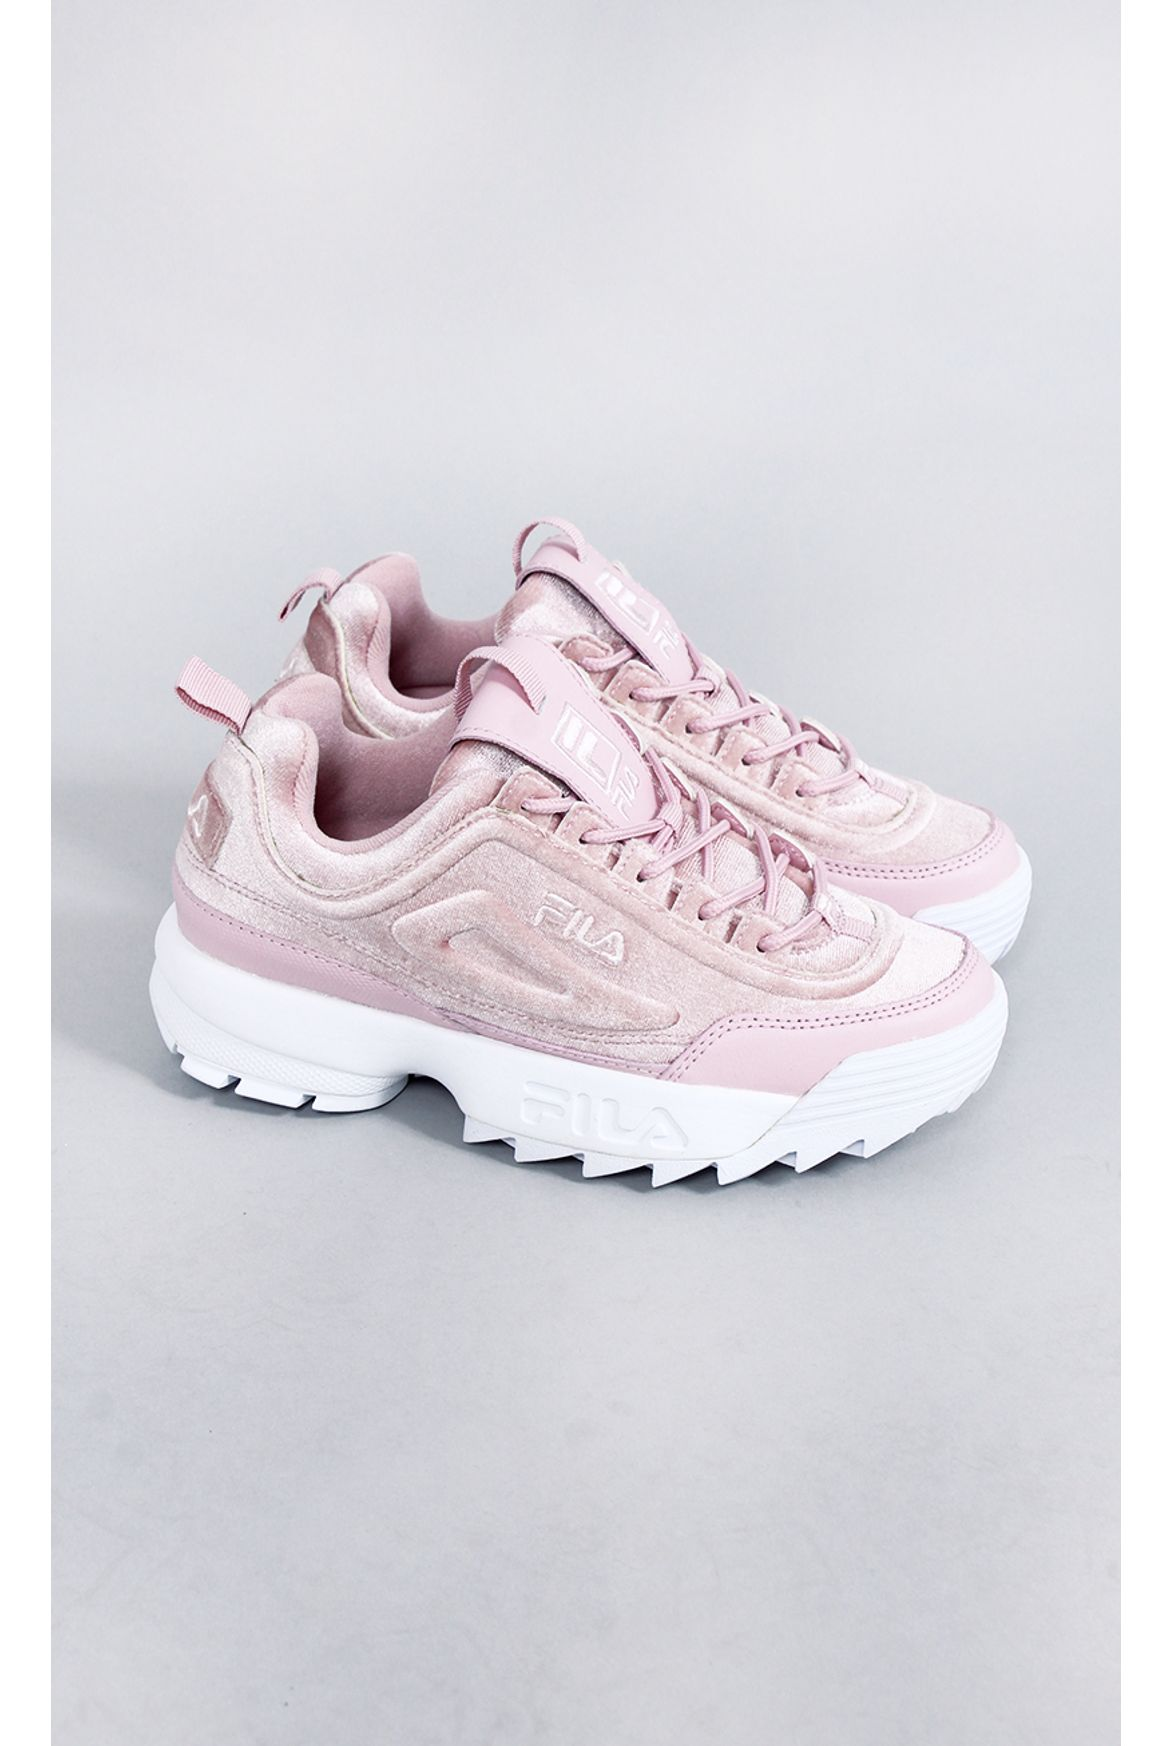 1bec687c025 FSHN tênis fila disruptor II premium velour rosa - Fashion Closet